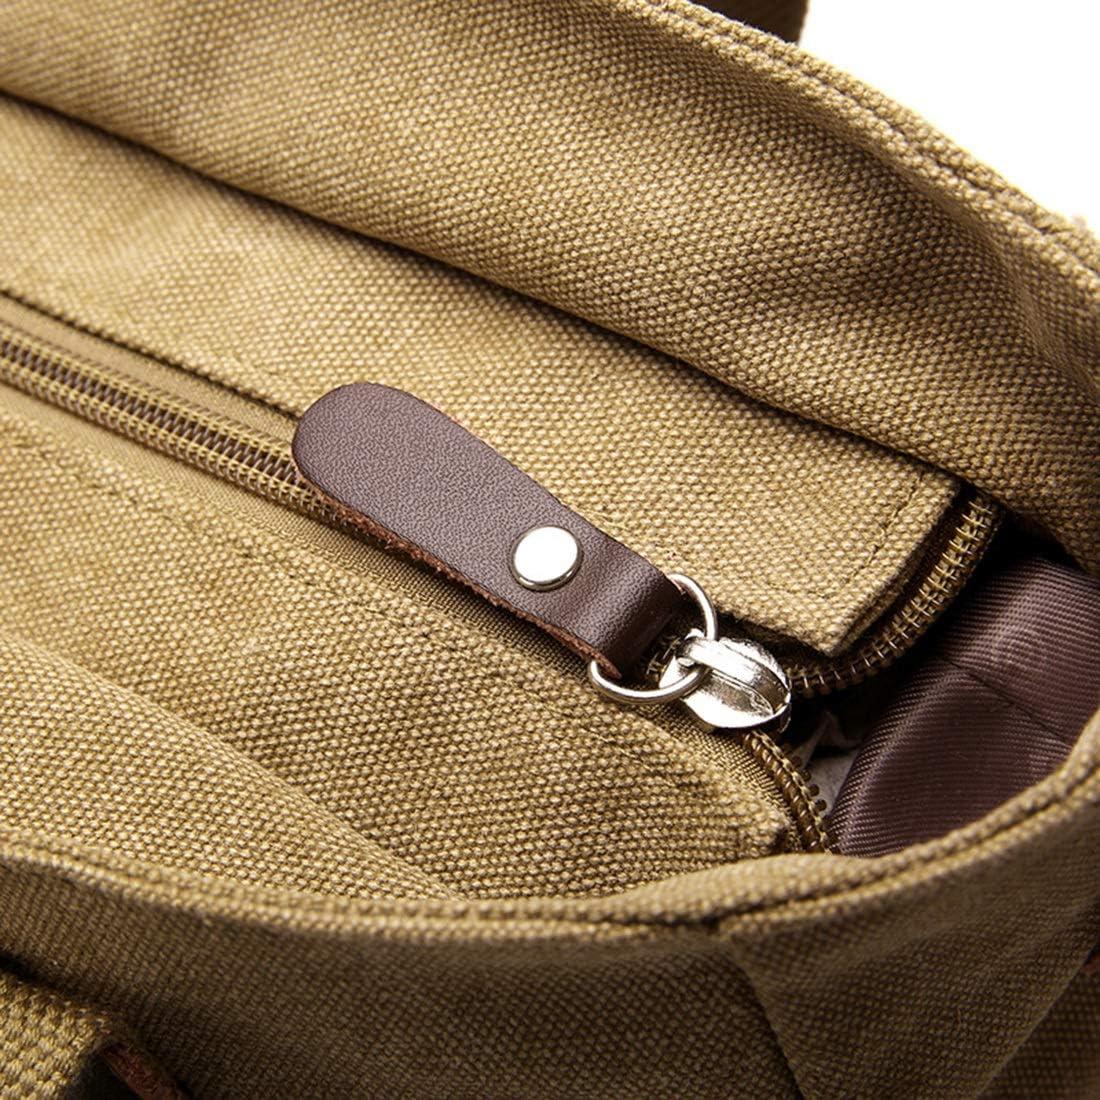 Color : Khaki Leisure Bag Business Tourism Pro-BikeUS Canvas Bag Handbag Diagonal Single Shoulder Bag Computer Bag